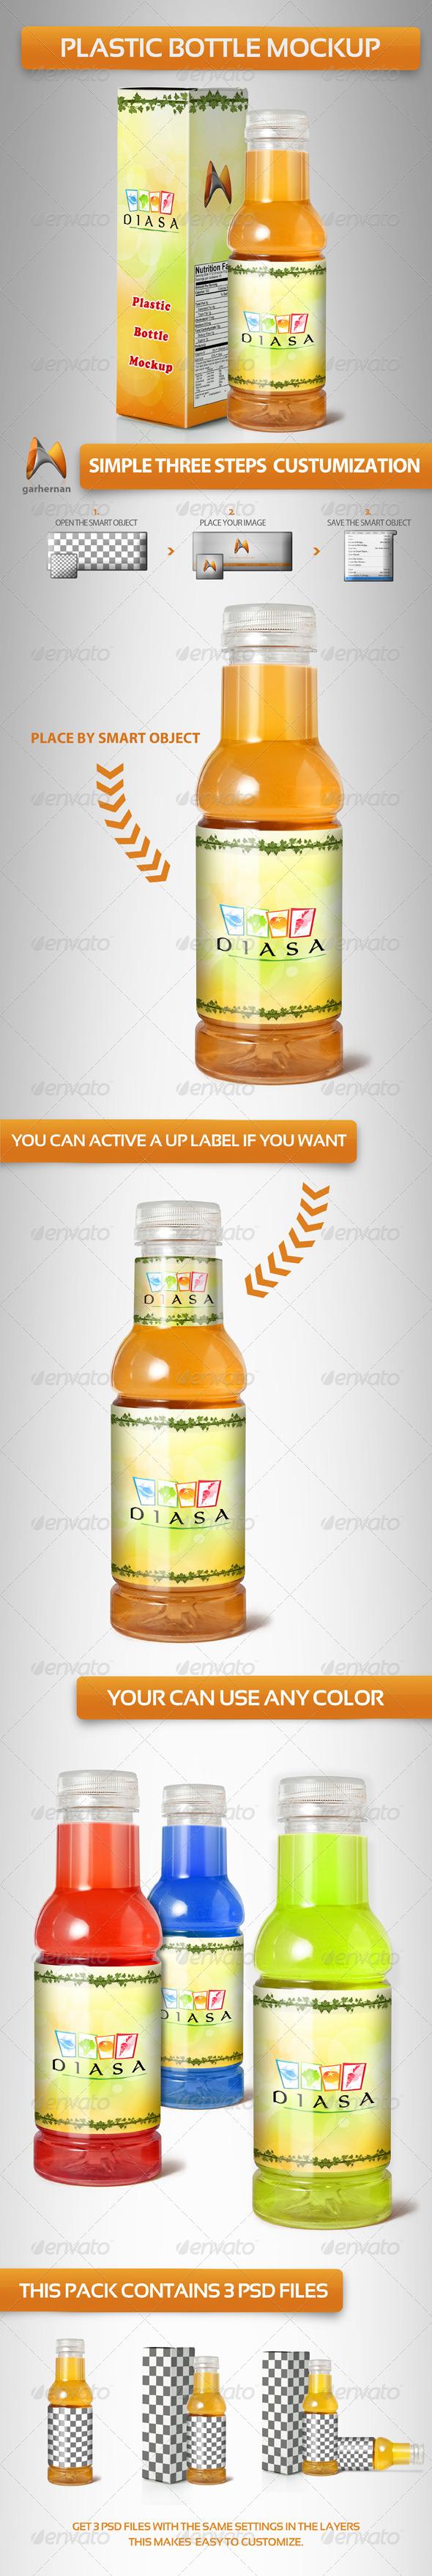 GraphicRiver Plastic Bottle Mockup 4453386